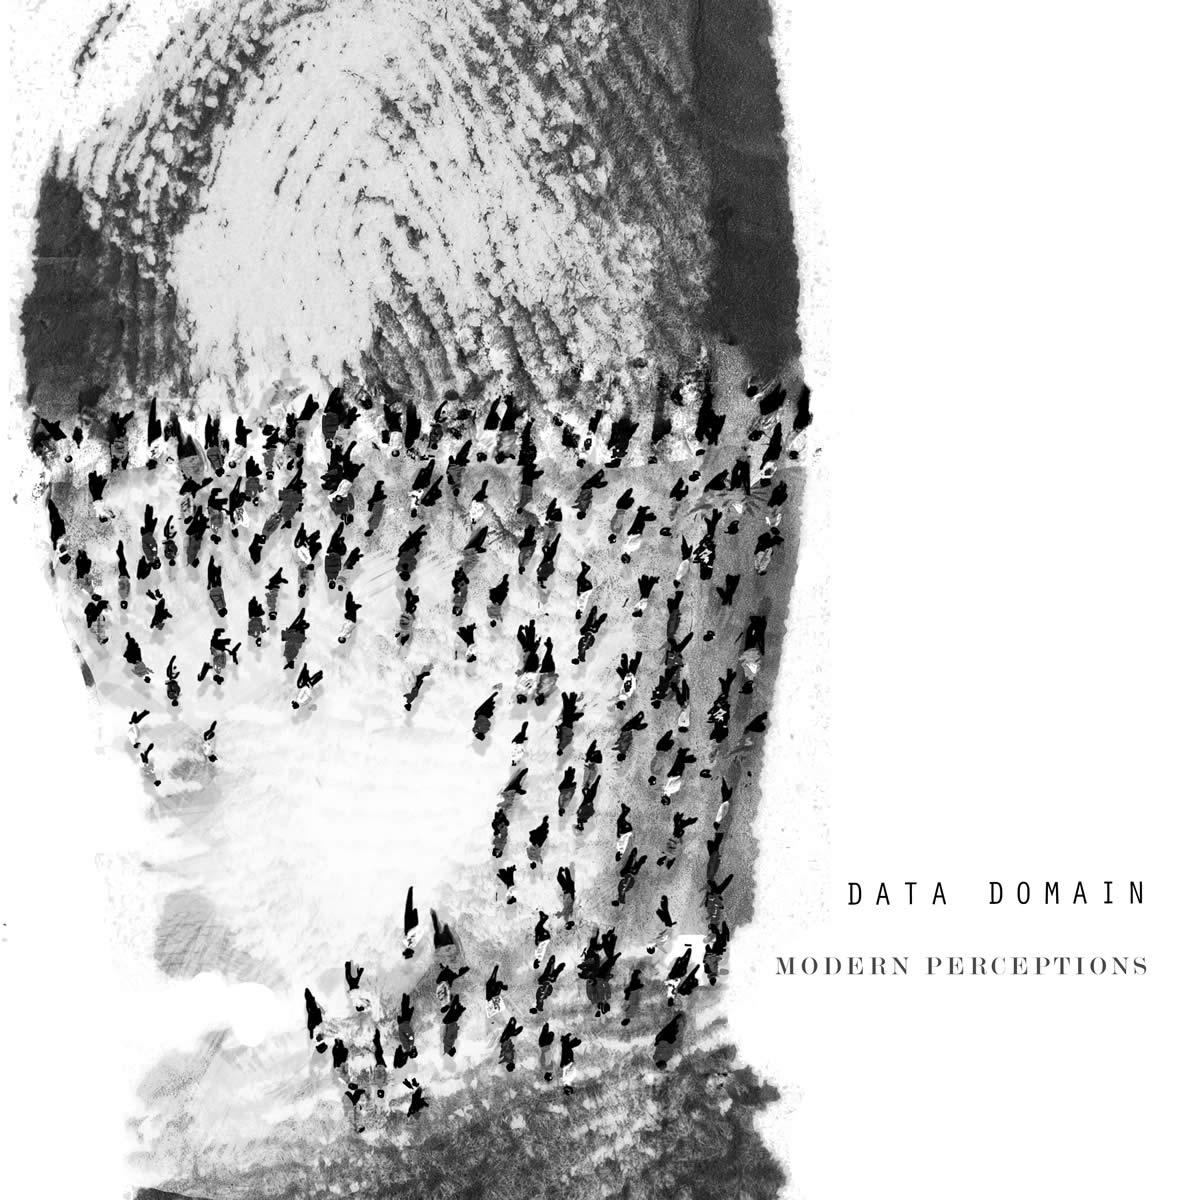 Data-Domain-Modern-Perceptions.jpg